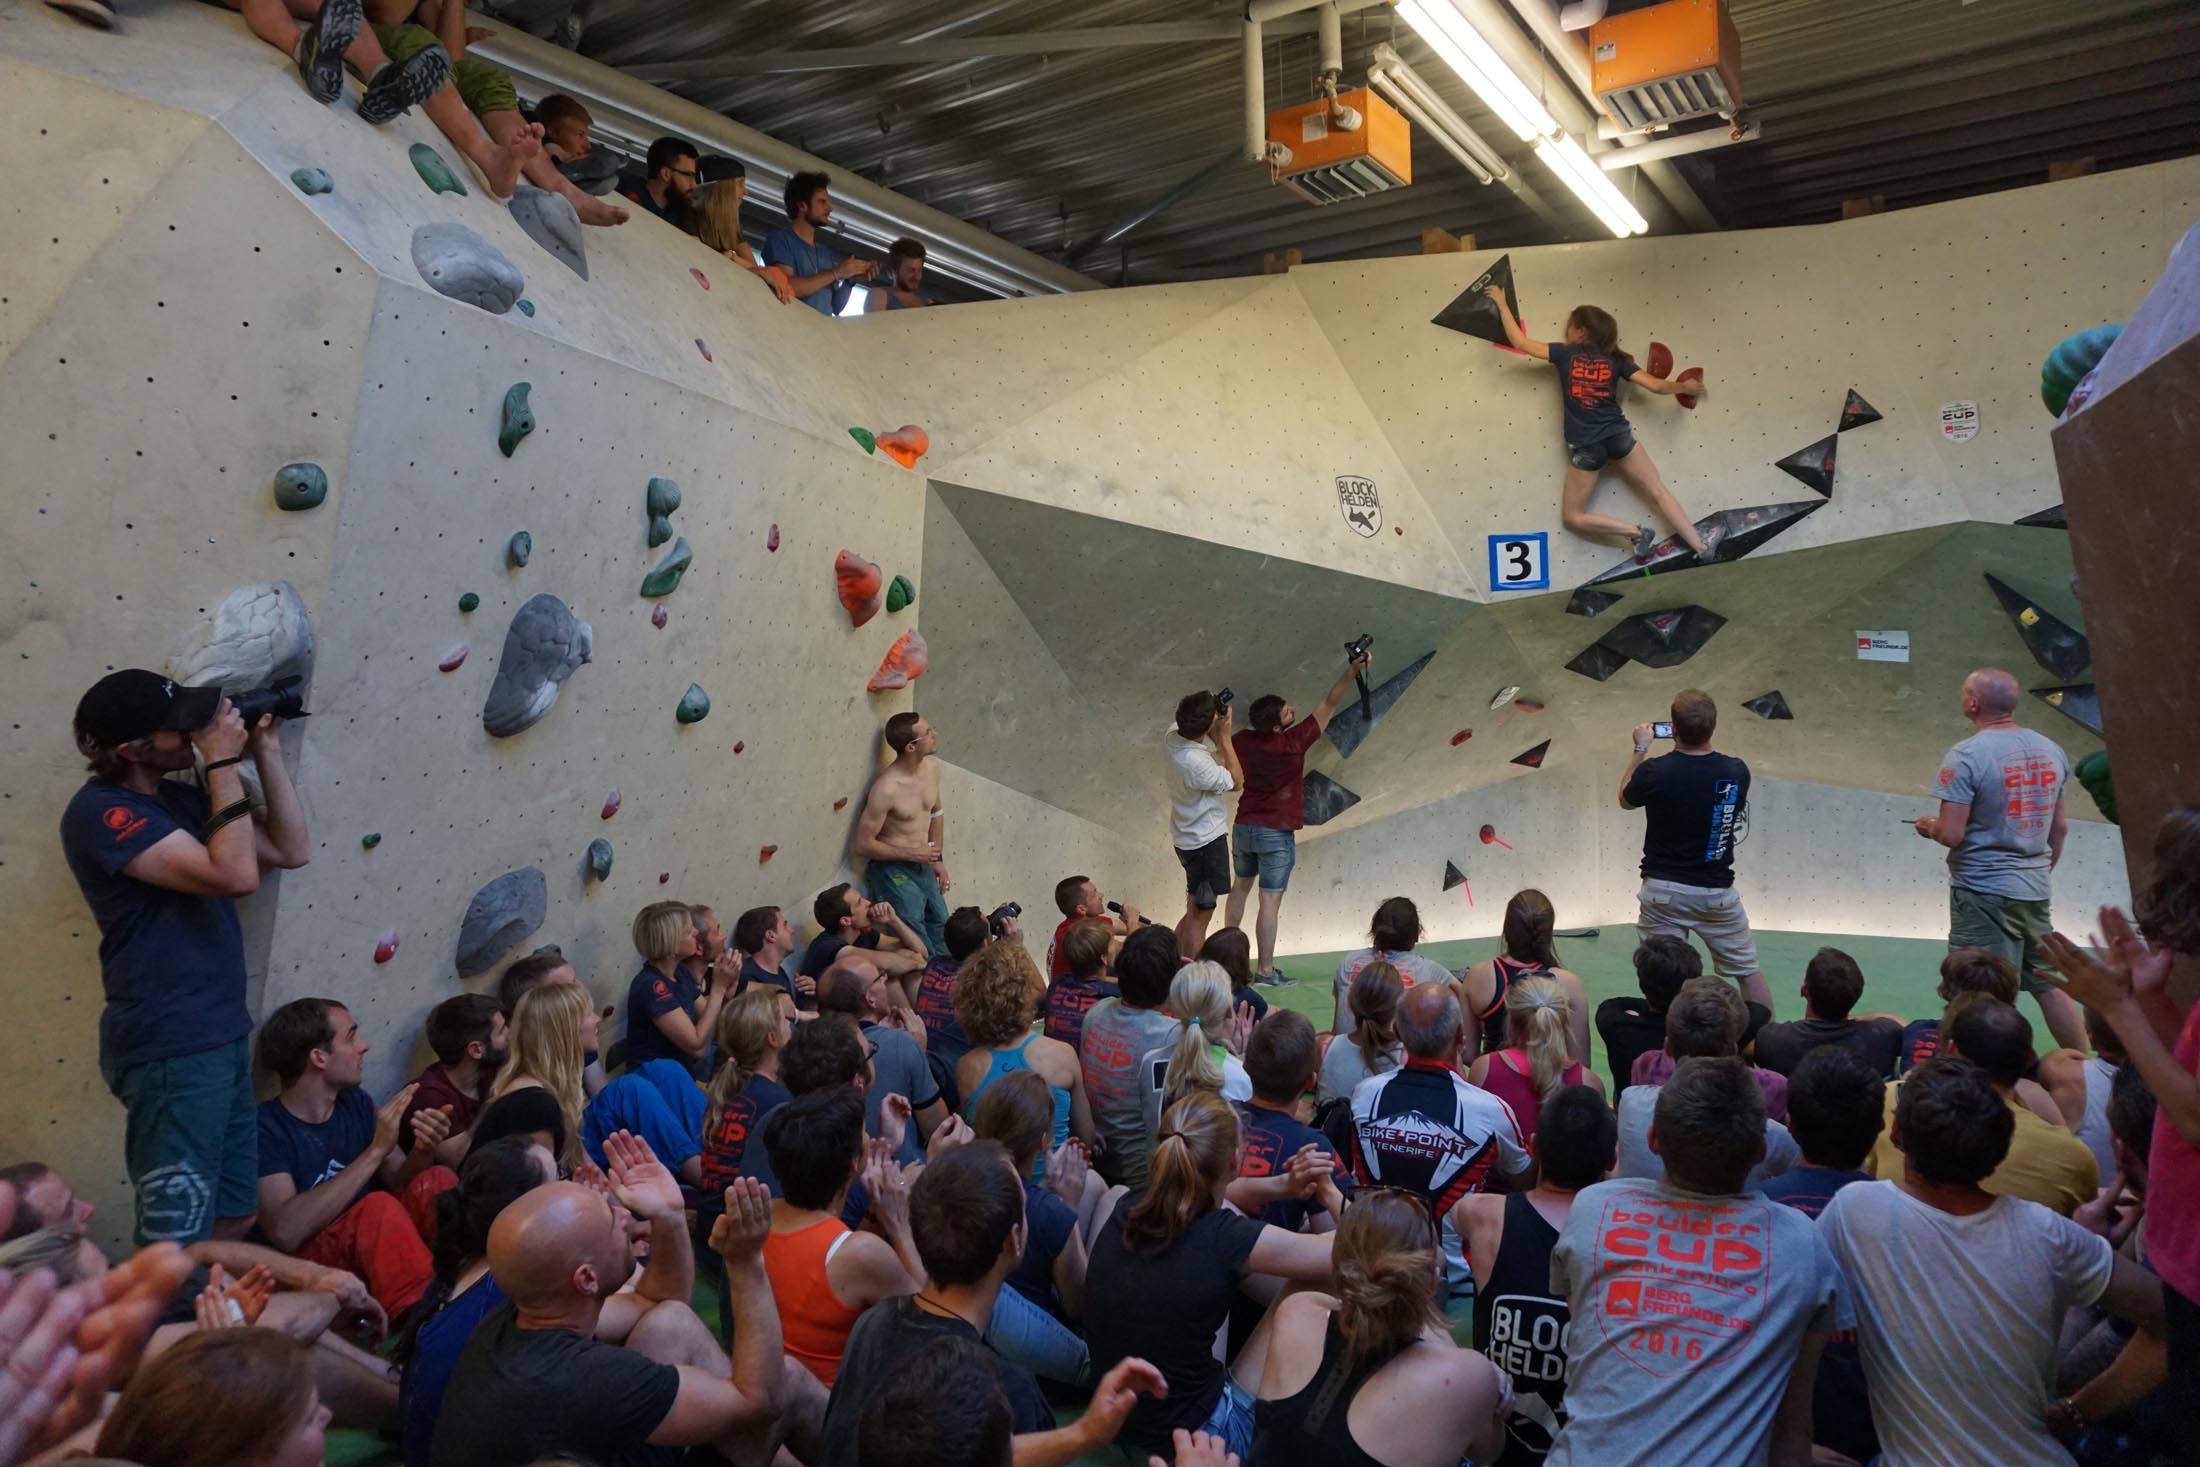 Finale, internationaler bouldercup Frankenjura 2016, BLOCKHELDEN Erlangen, Mammut, Bergfreunde.de, Boulderwettkampf07092016673